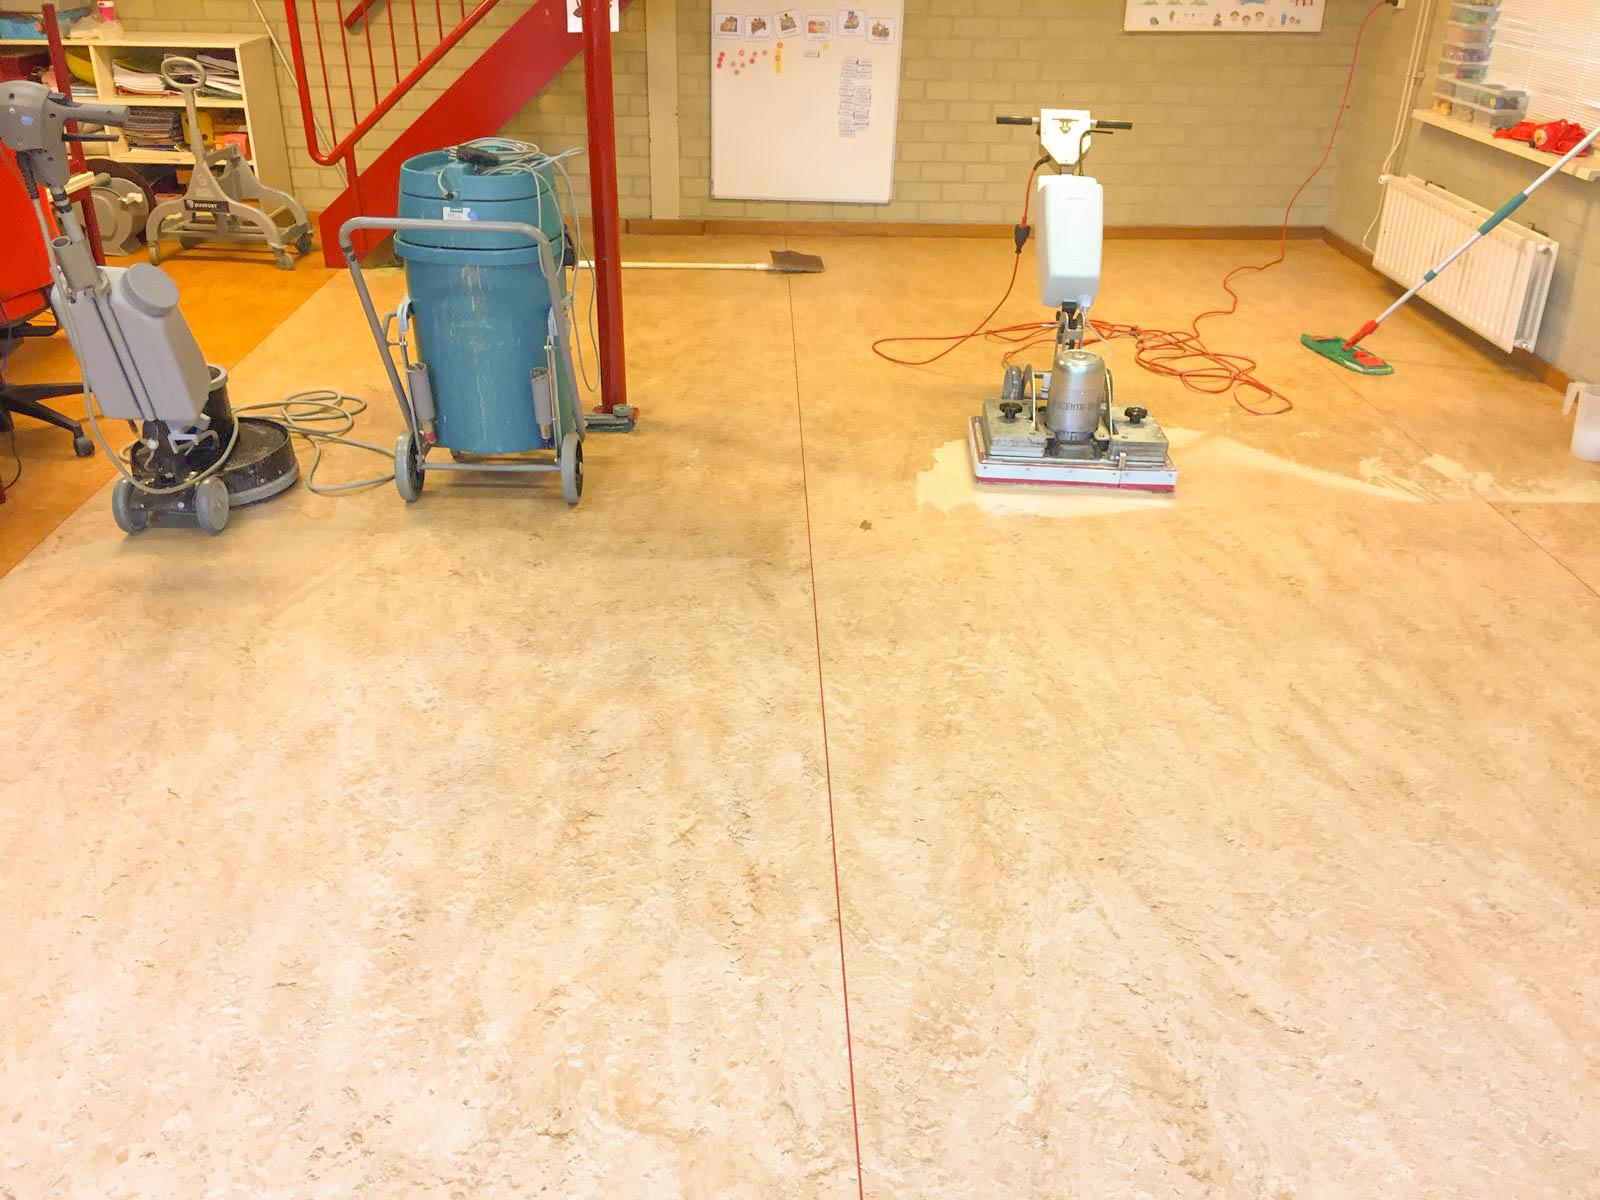 Linoleum Vloer Onderhoud : Linoleum weer in uitstekende conditie vloeronderhoud duofort